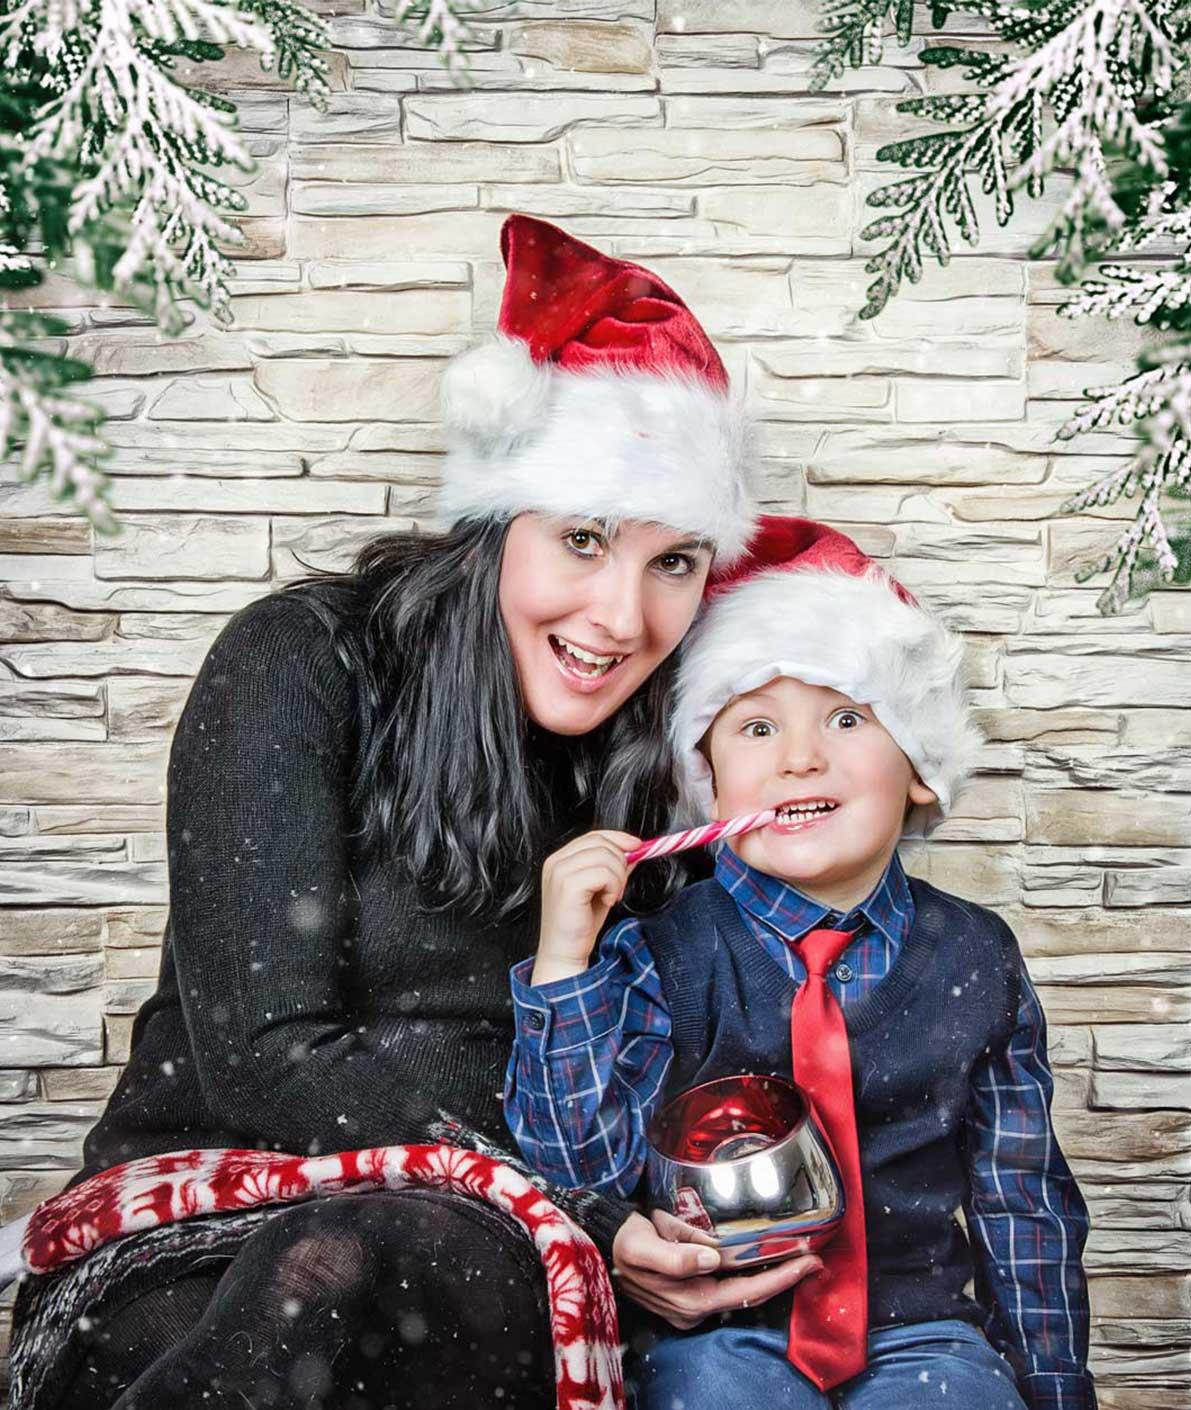 True-Creative-Agency-Familienportraits-3-1